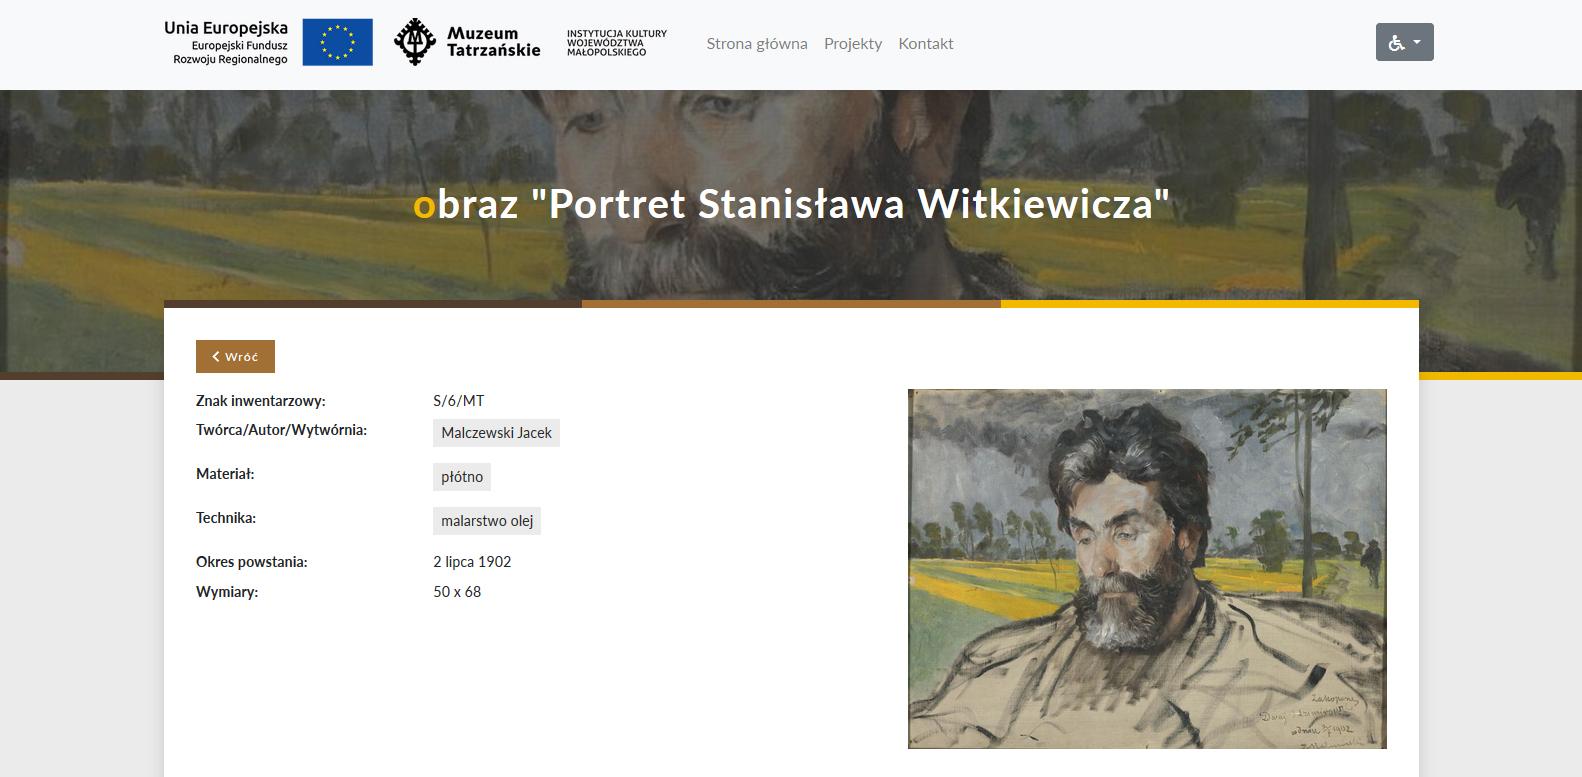 muzeumtatrzanskie.pl/portal